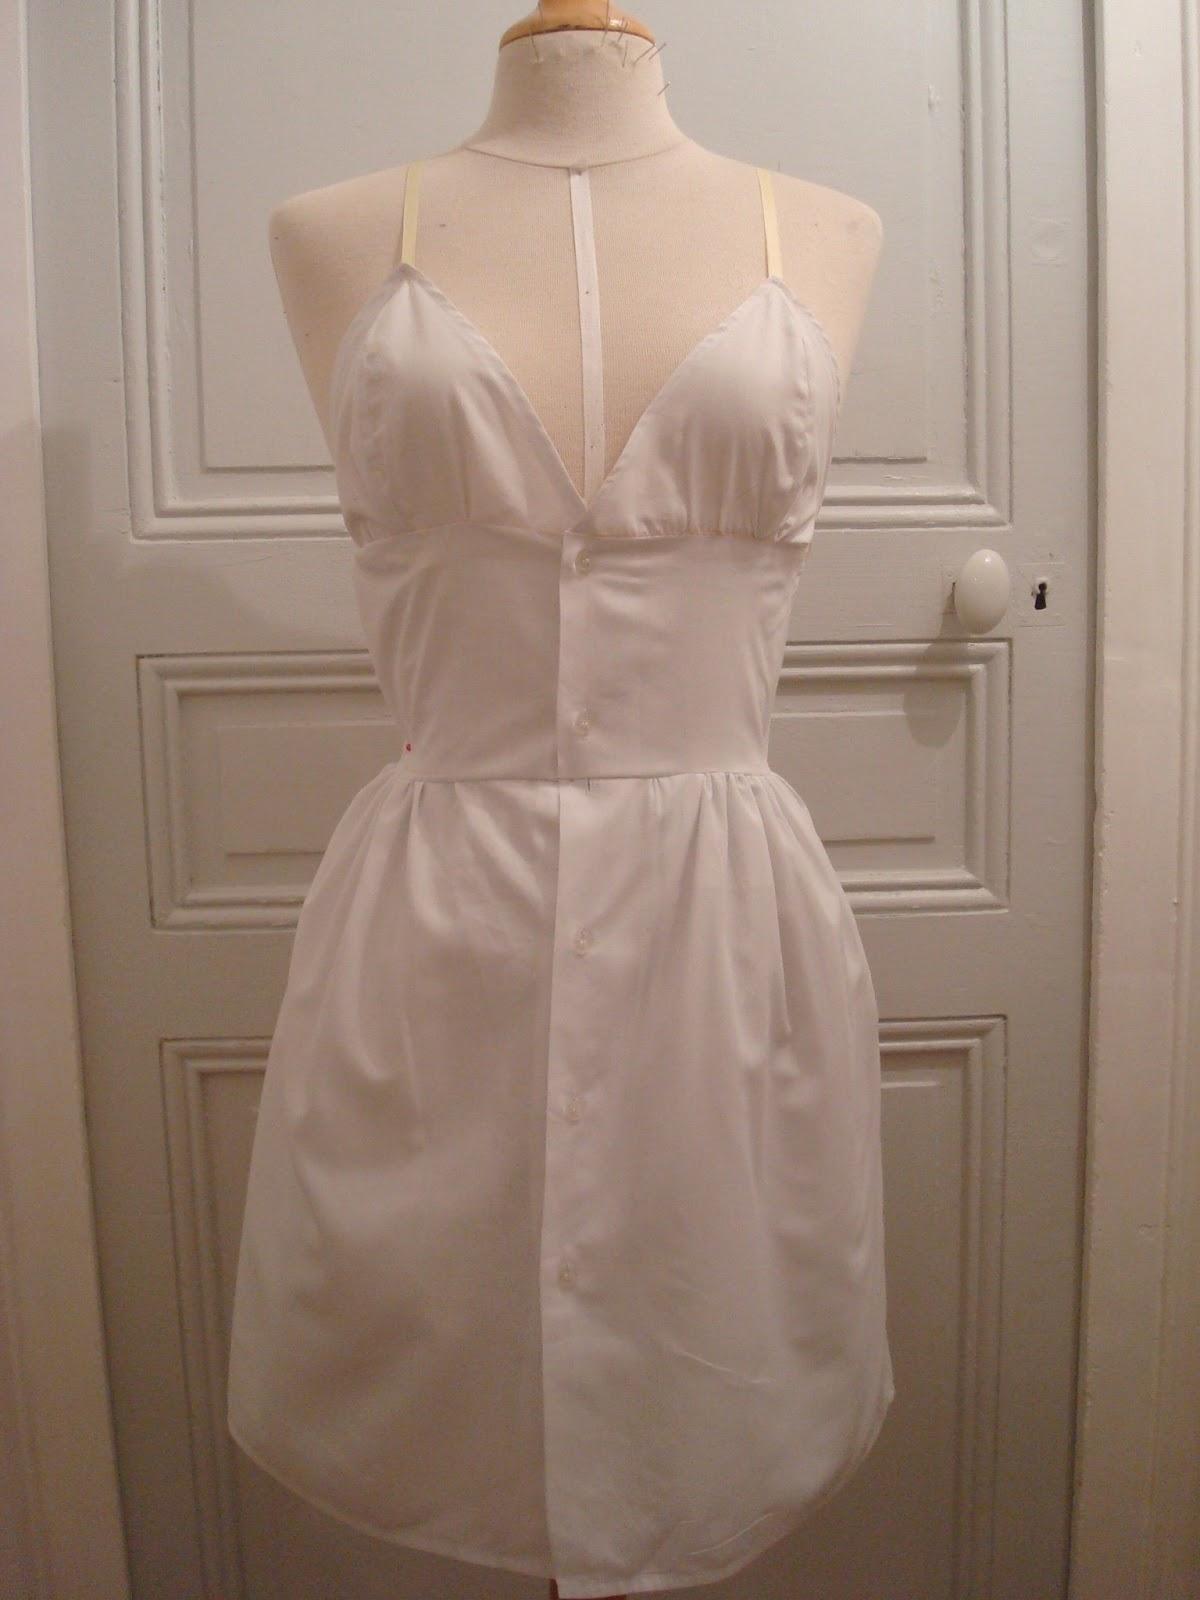 Crafty bitches blog diy couture d co vintage tuto couture do it yourself d coration - Blog couture deco maison ...